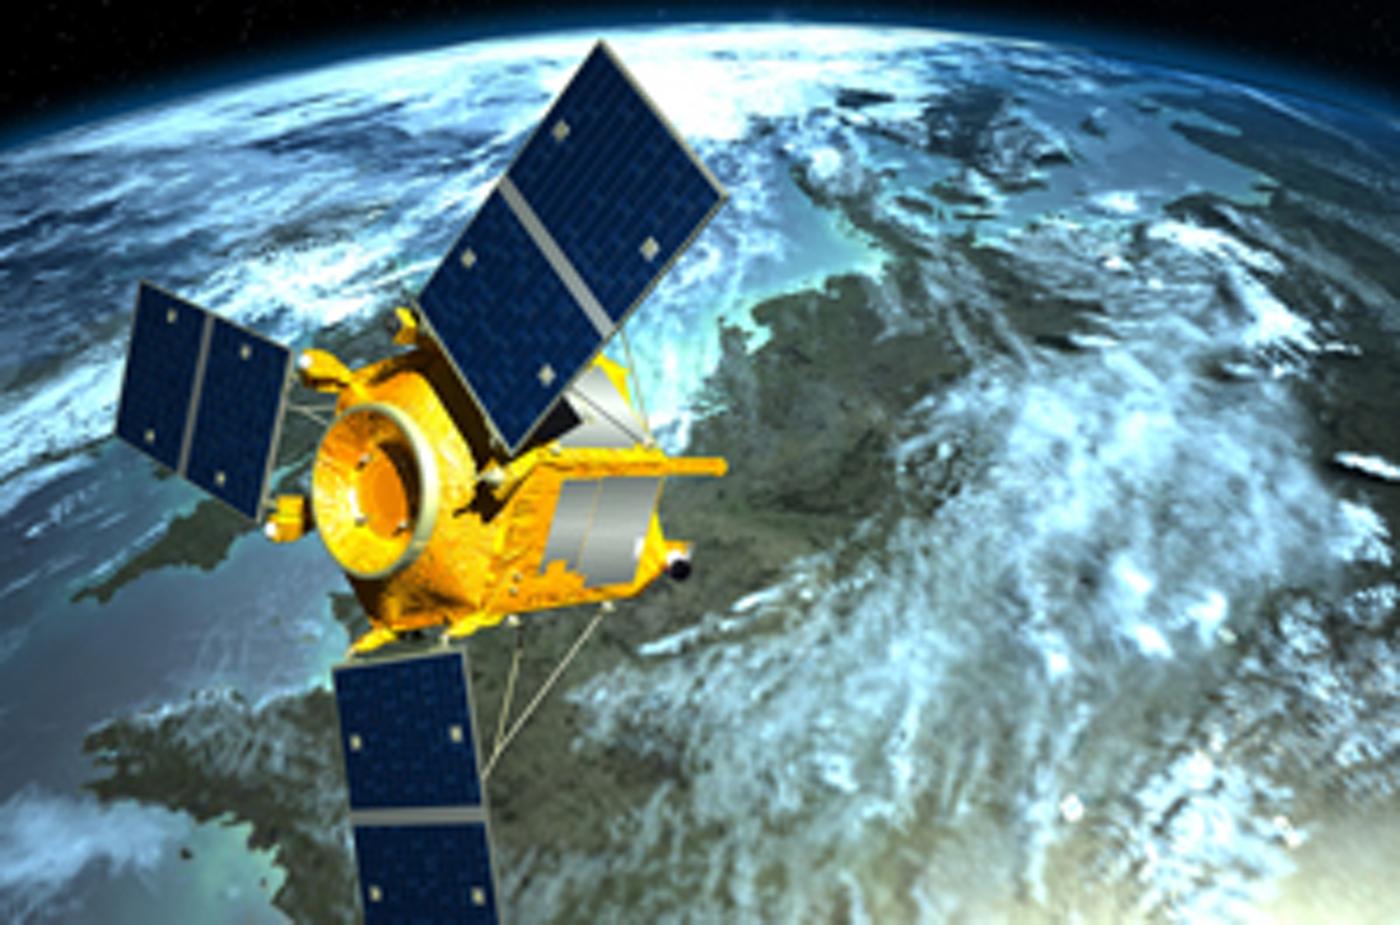 spacecraft and satellite - photo #14